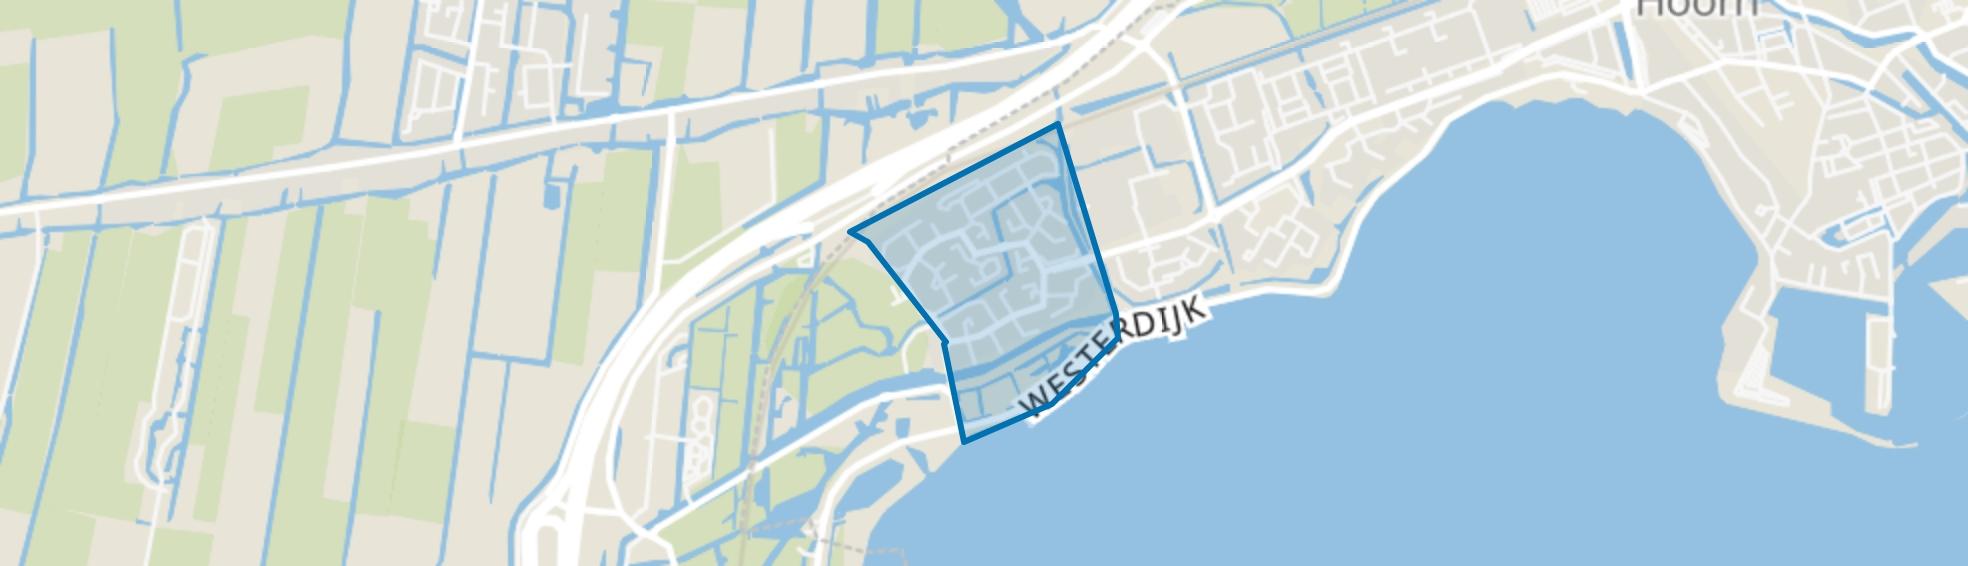 Grote Waal - Buurt 13 07, Hoorn (NH) map